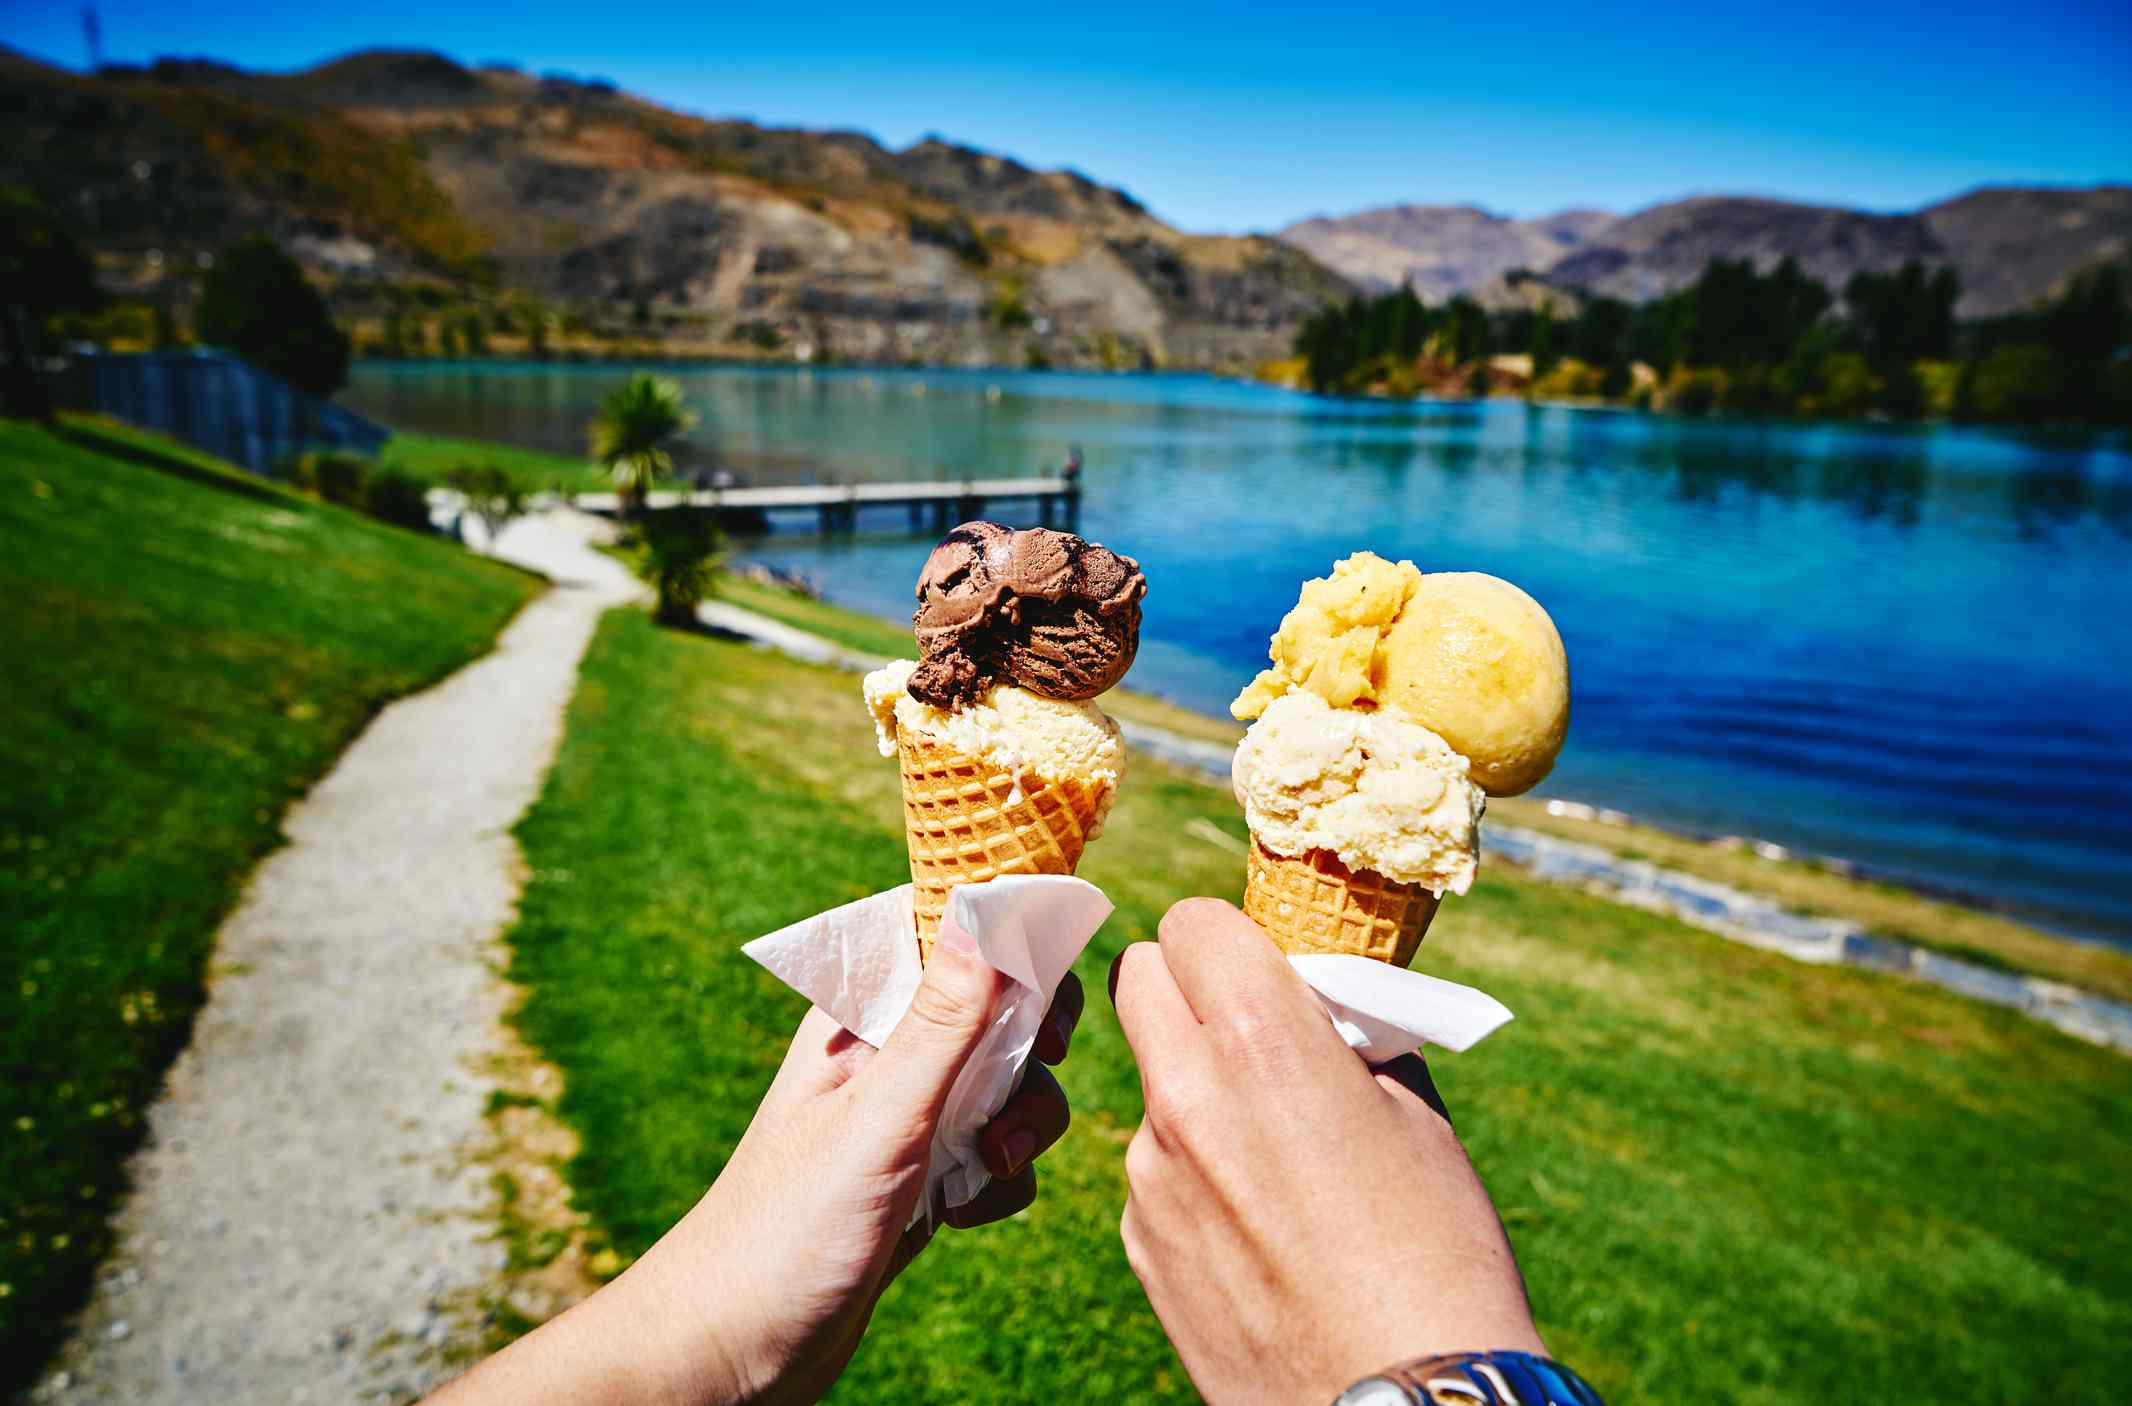 Holding Sweet Ice Cream Corn, Cromwell, New Zealand